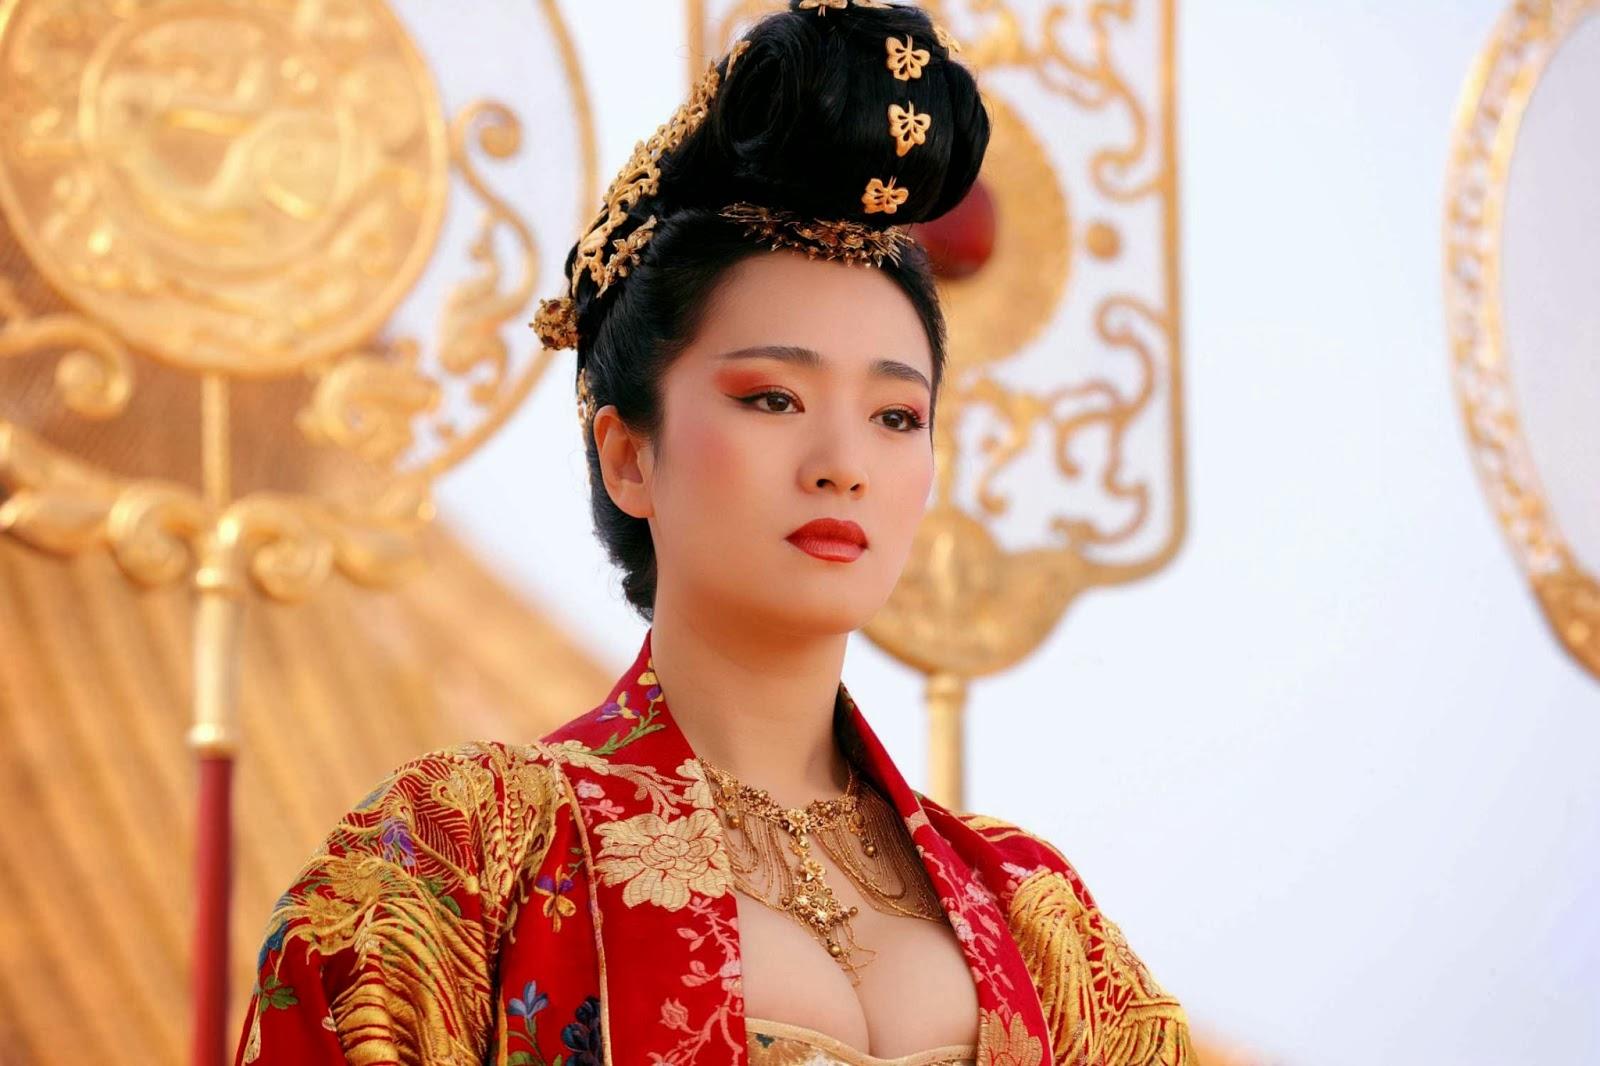 HD Wallpapers: Gong Li HD Wallpapers